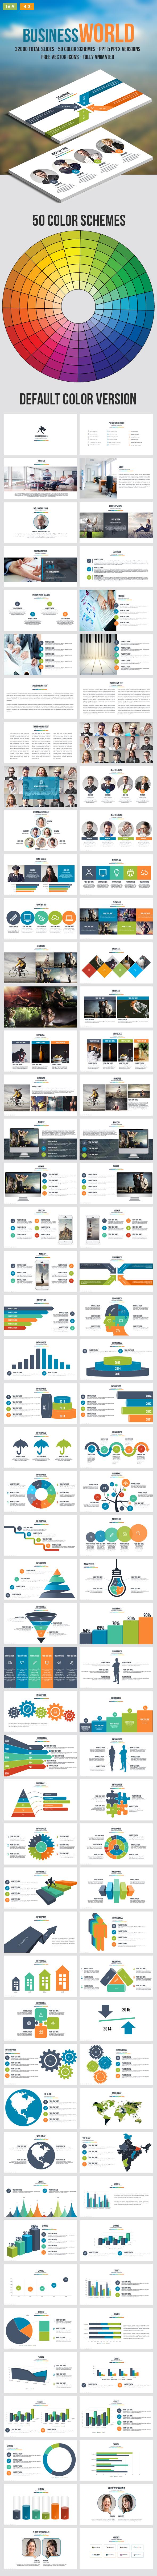 Business World - Multipurpose Powerpoint Template - Business PowerPoint Templates